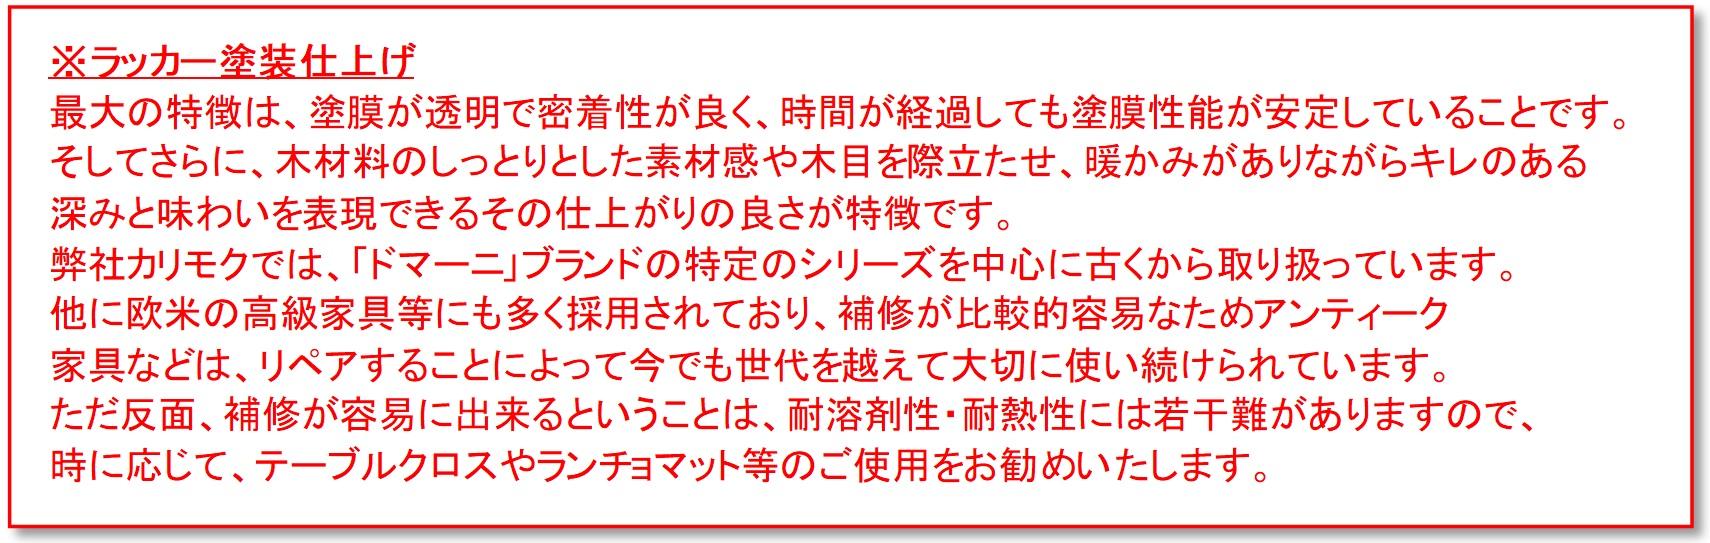 https://www.karimoku.co.jp/blog/repair/190401.jpg